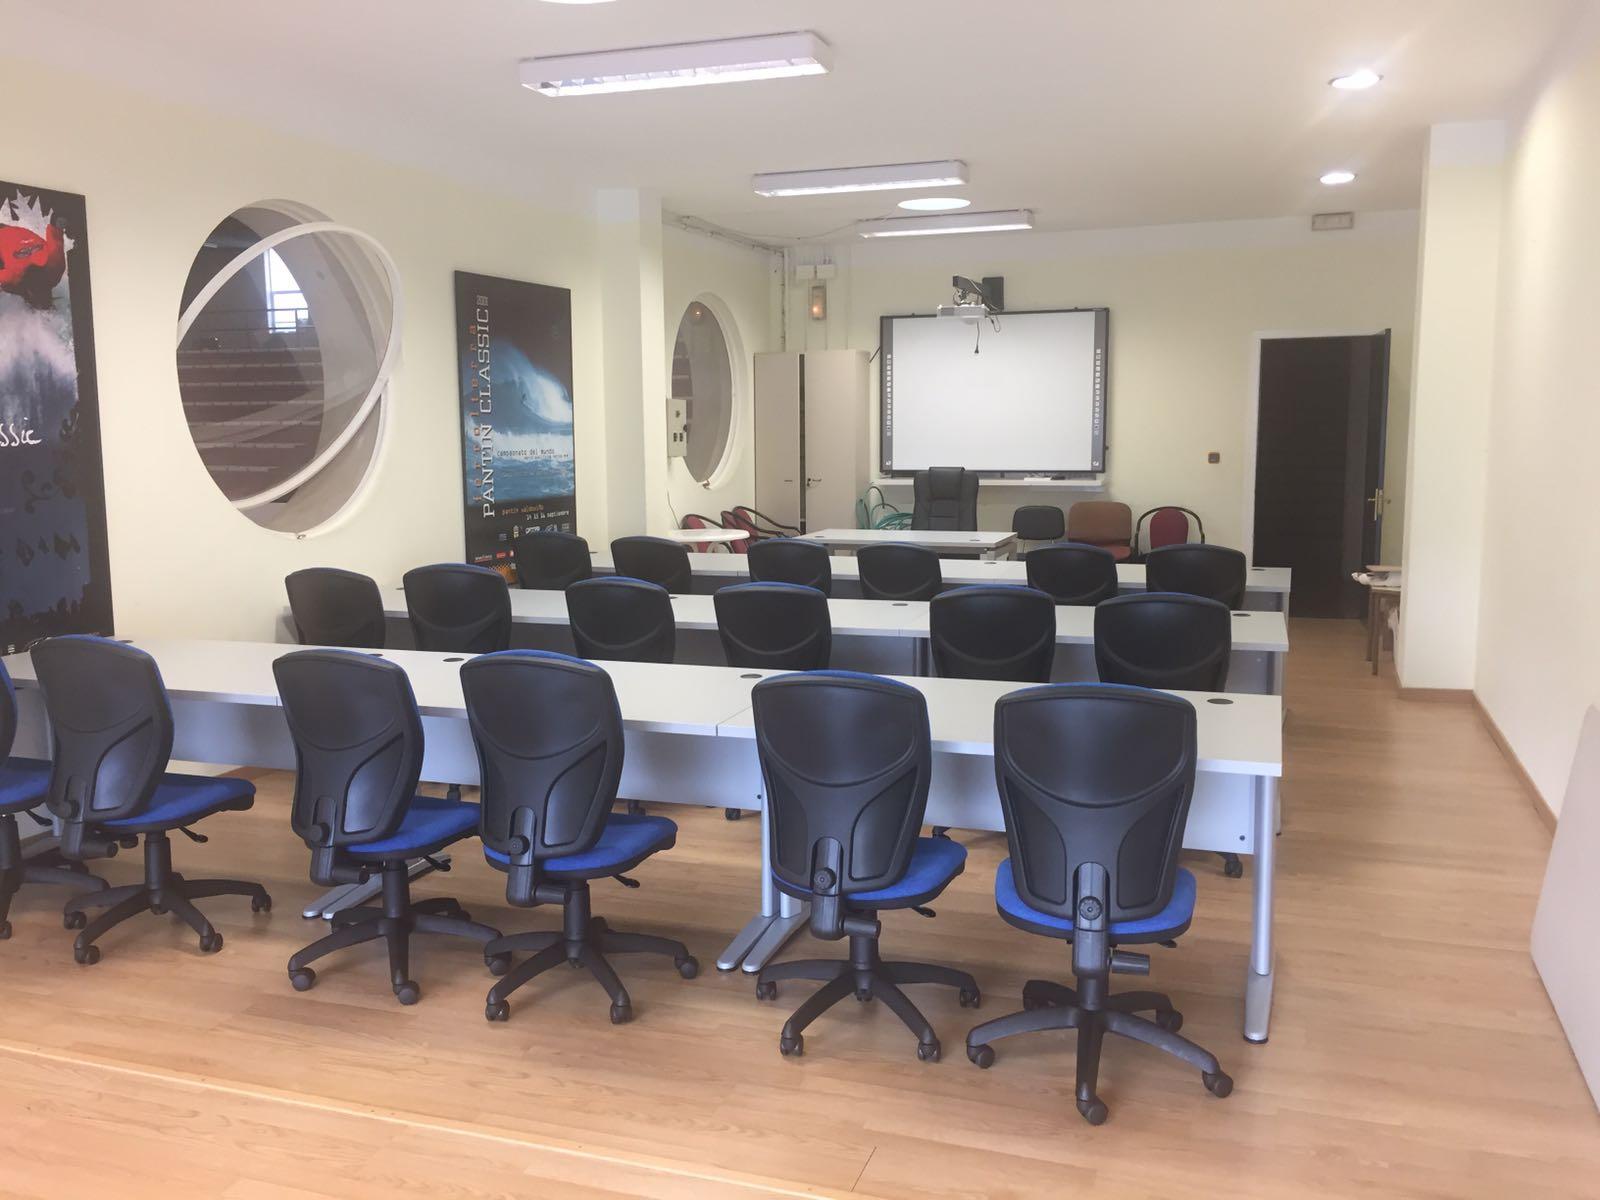 Nova aula multidisciplinar naprimeira planta do polideportivo municipal de Cedeira